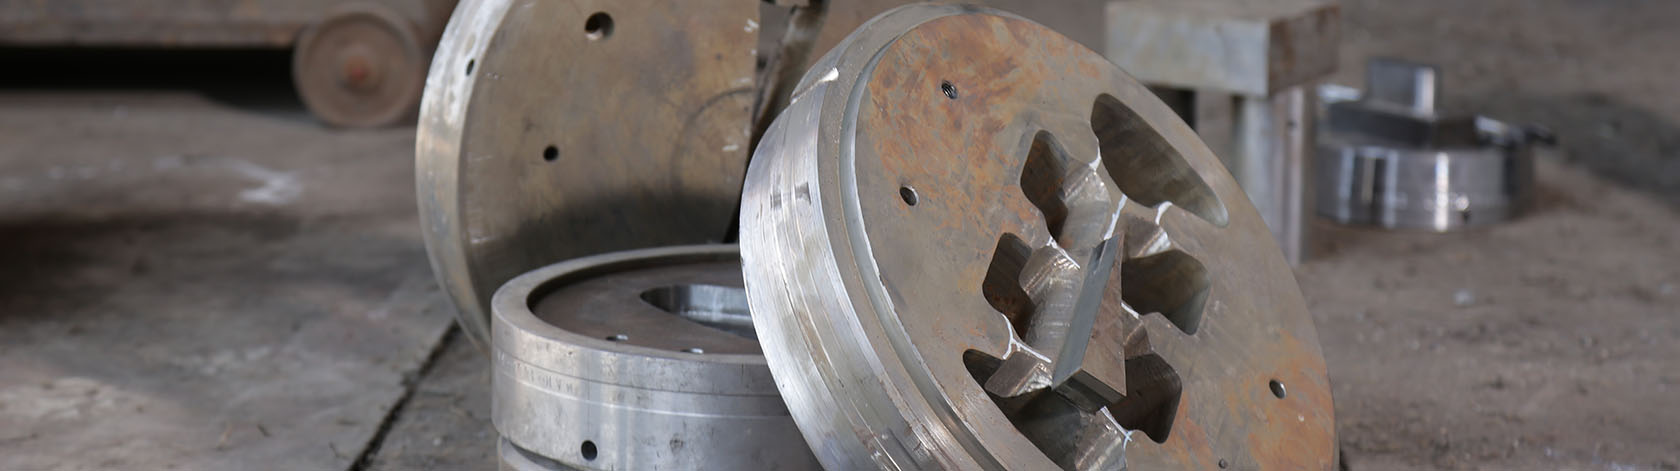 heat-treatment-of-hot-work-steels-1